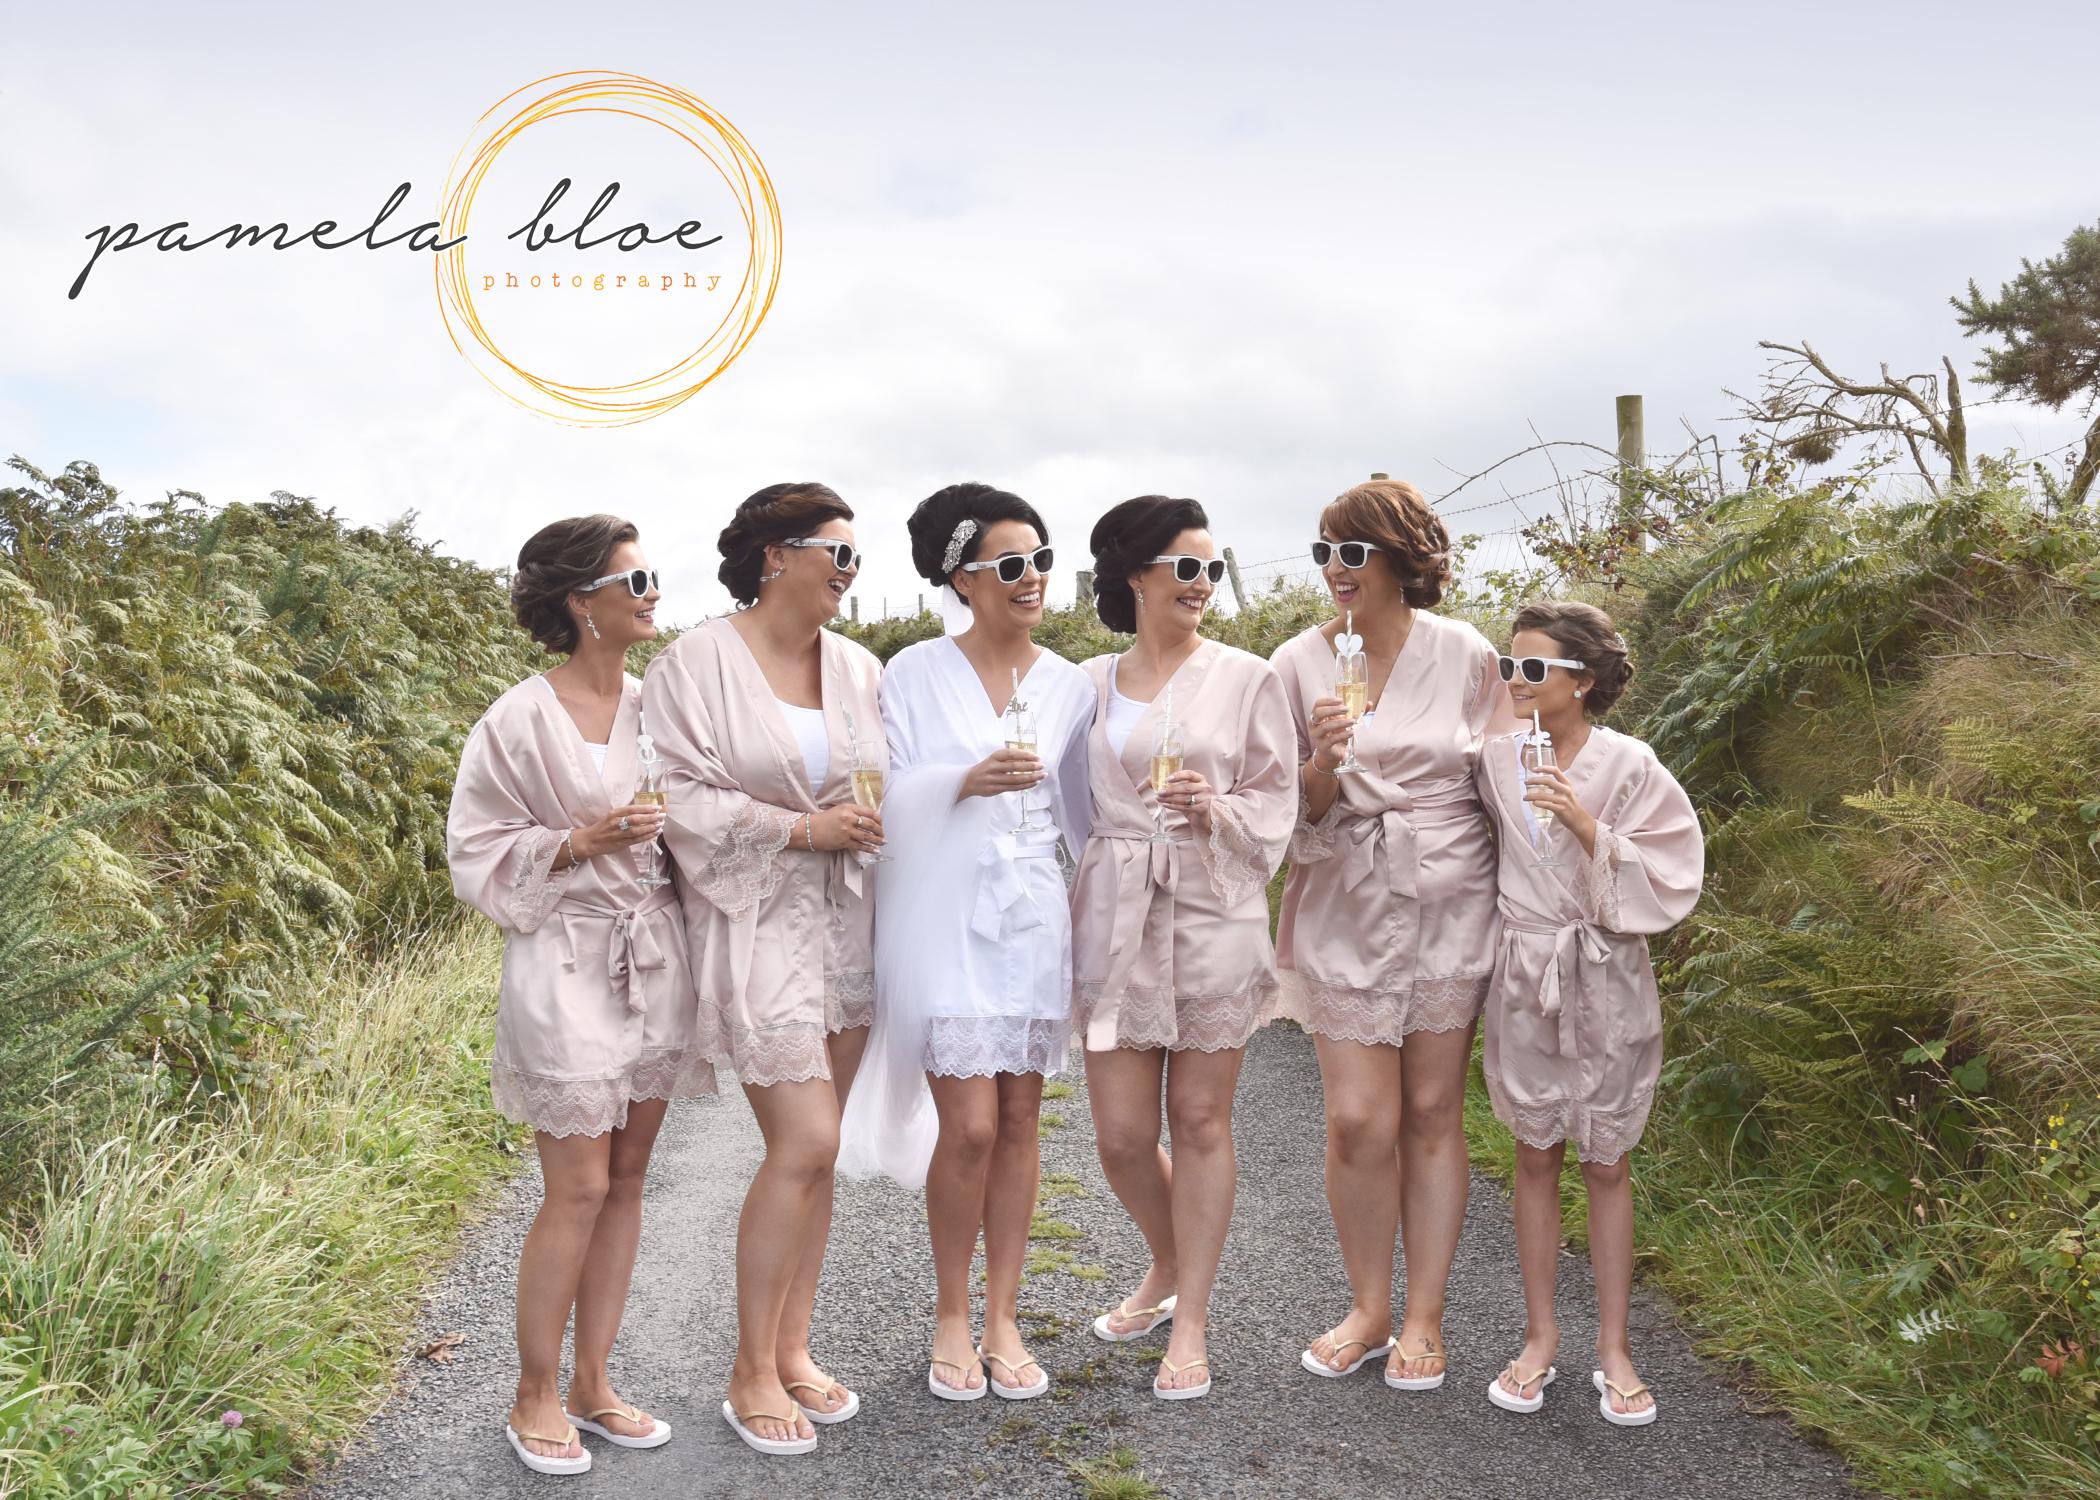 bridesmaid-pyjamas-photoshoot-team-bride-wedding